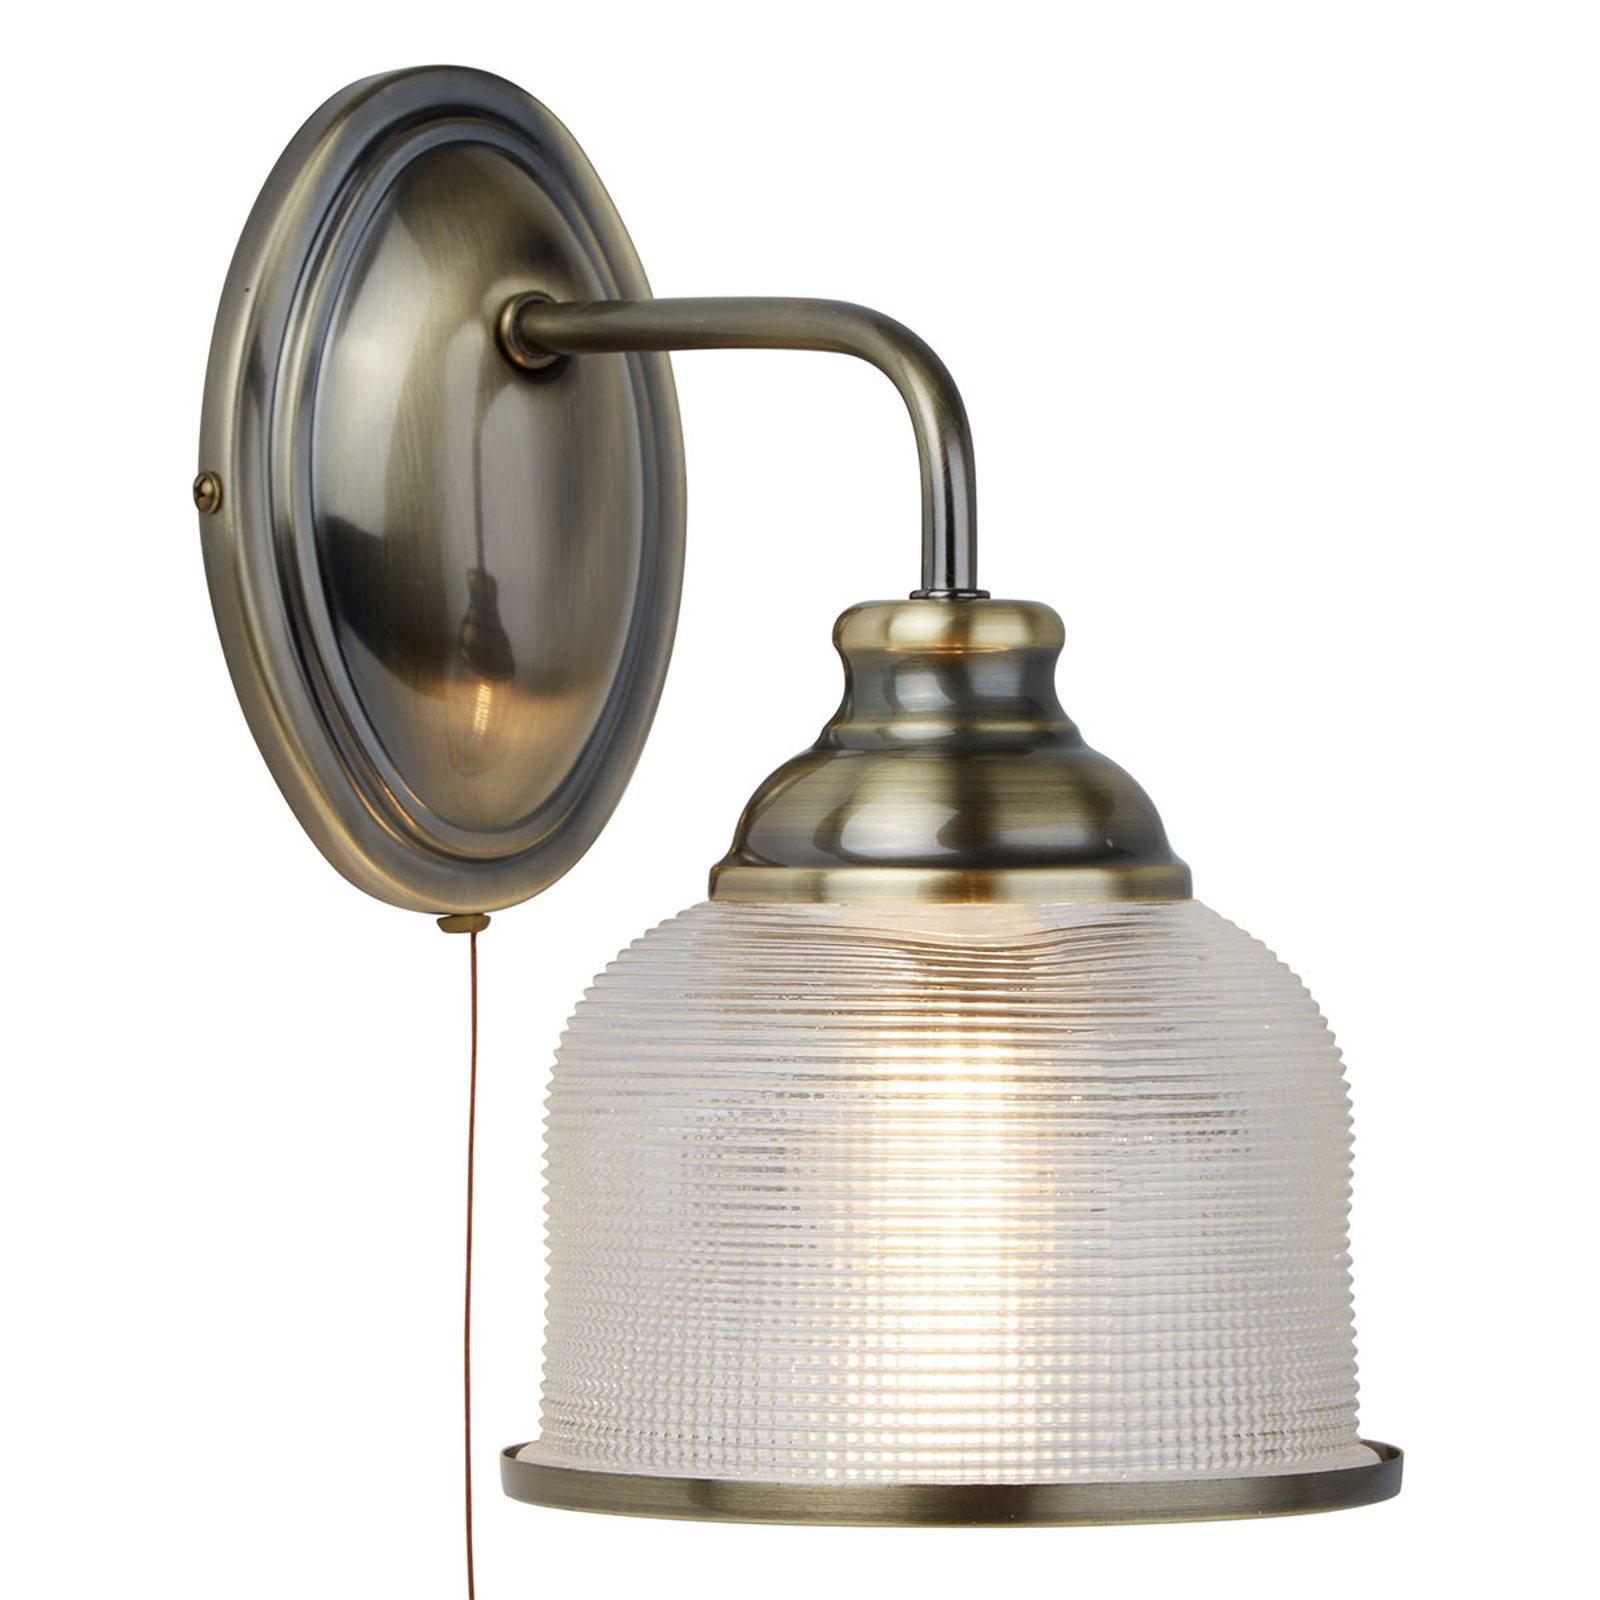 Holofanglass-vegglampe Bistro II, antikkmessing